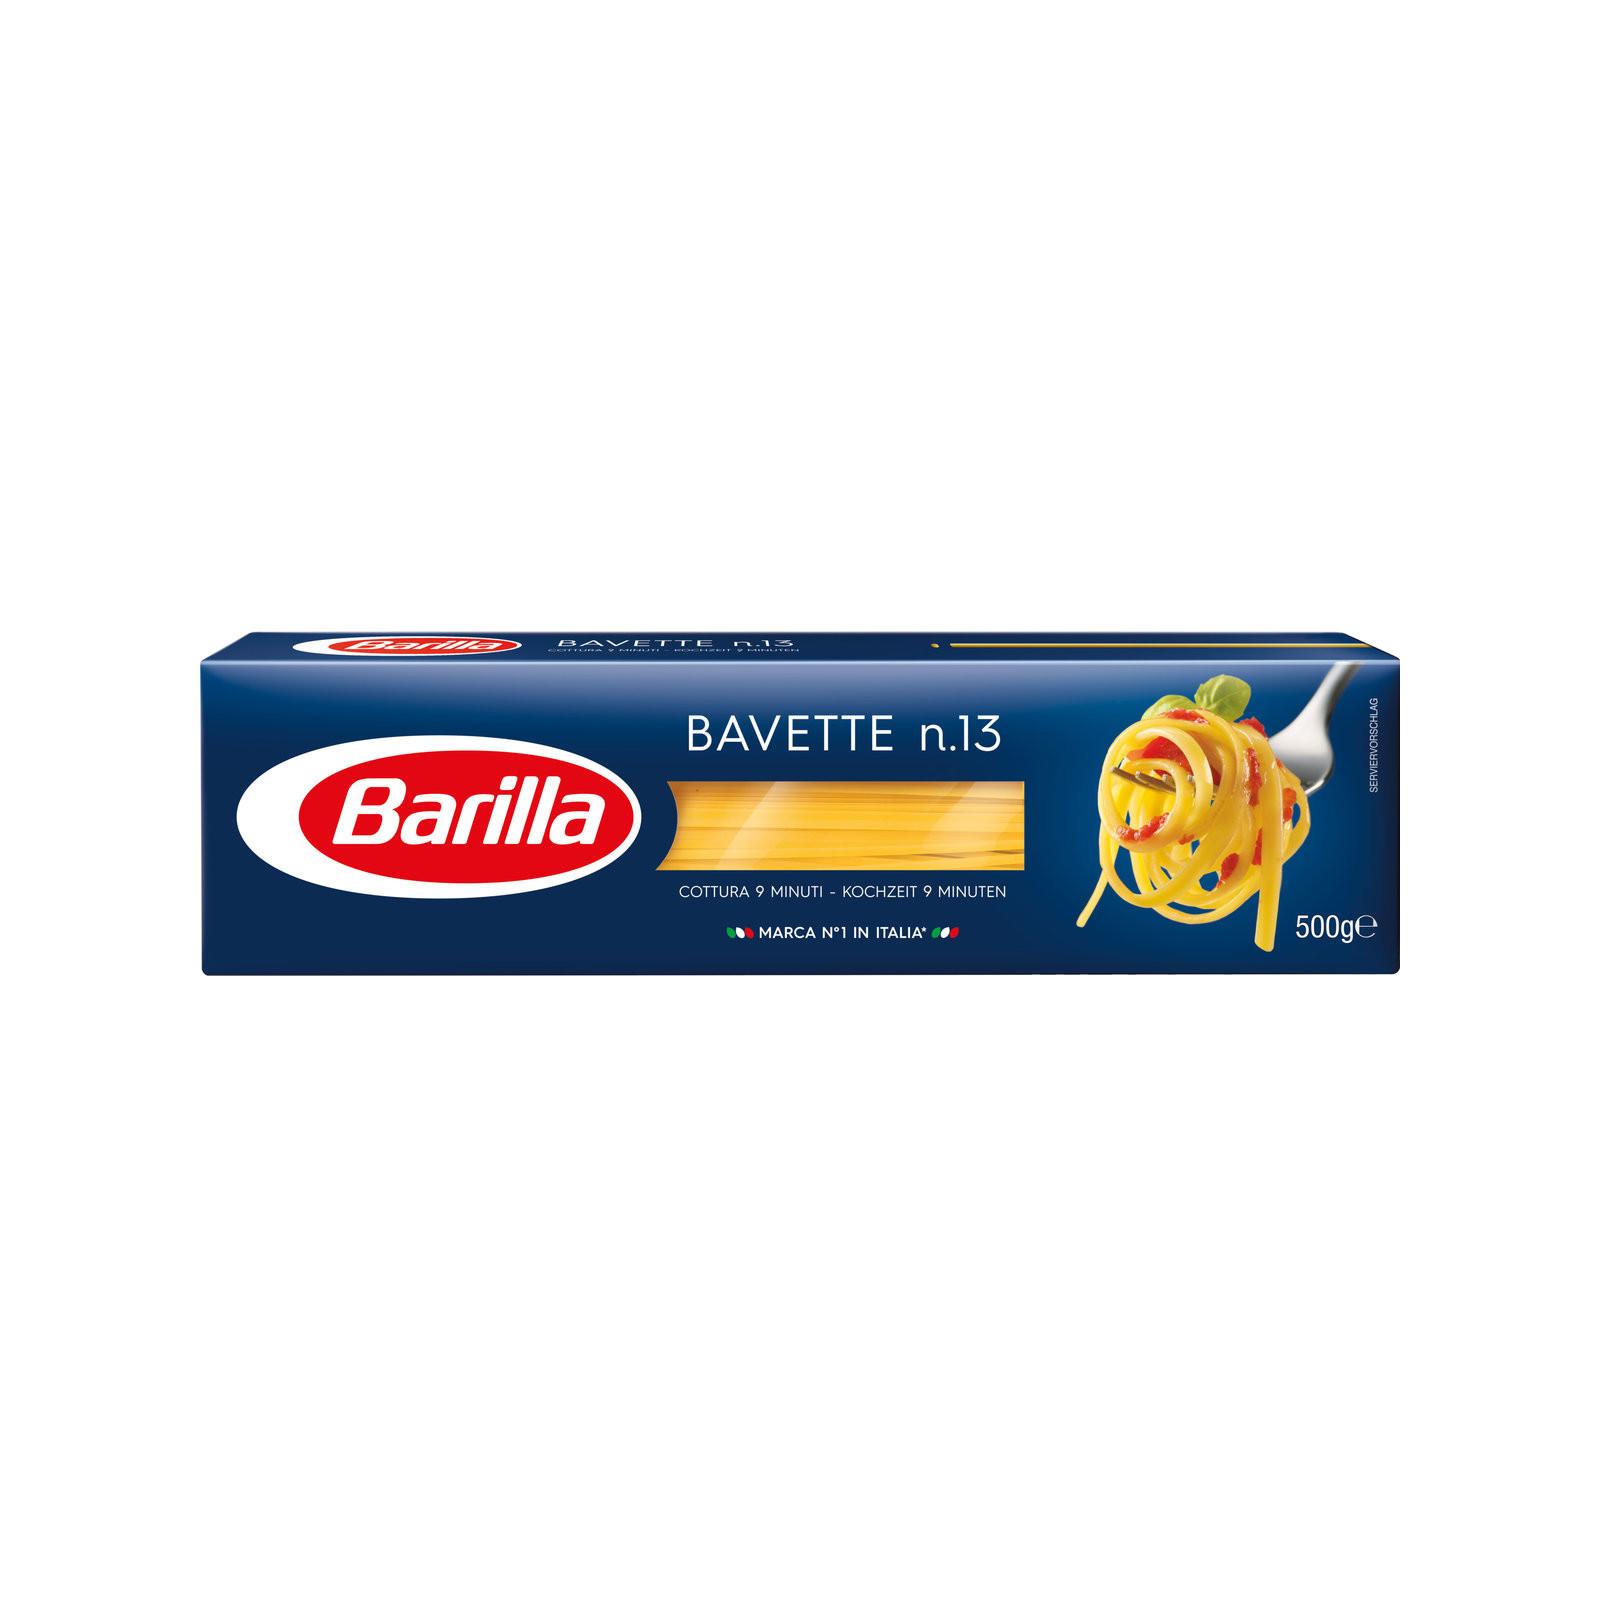 Bavette no13